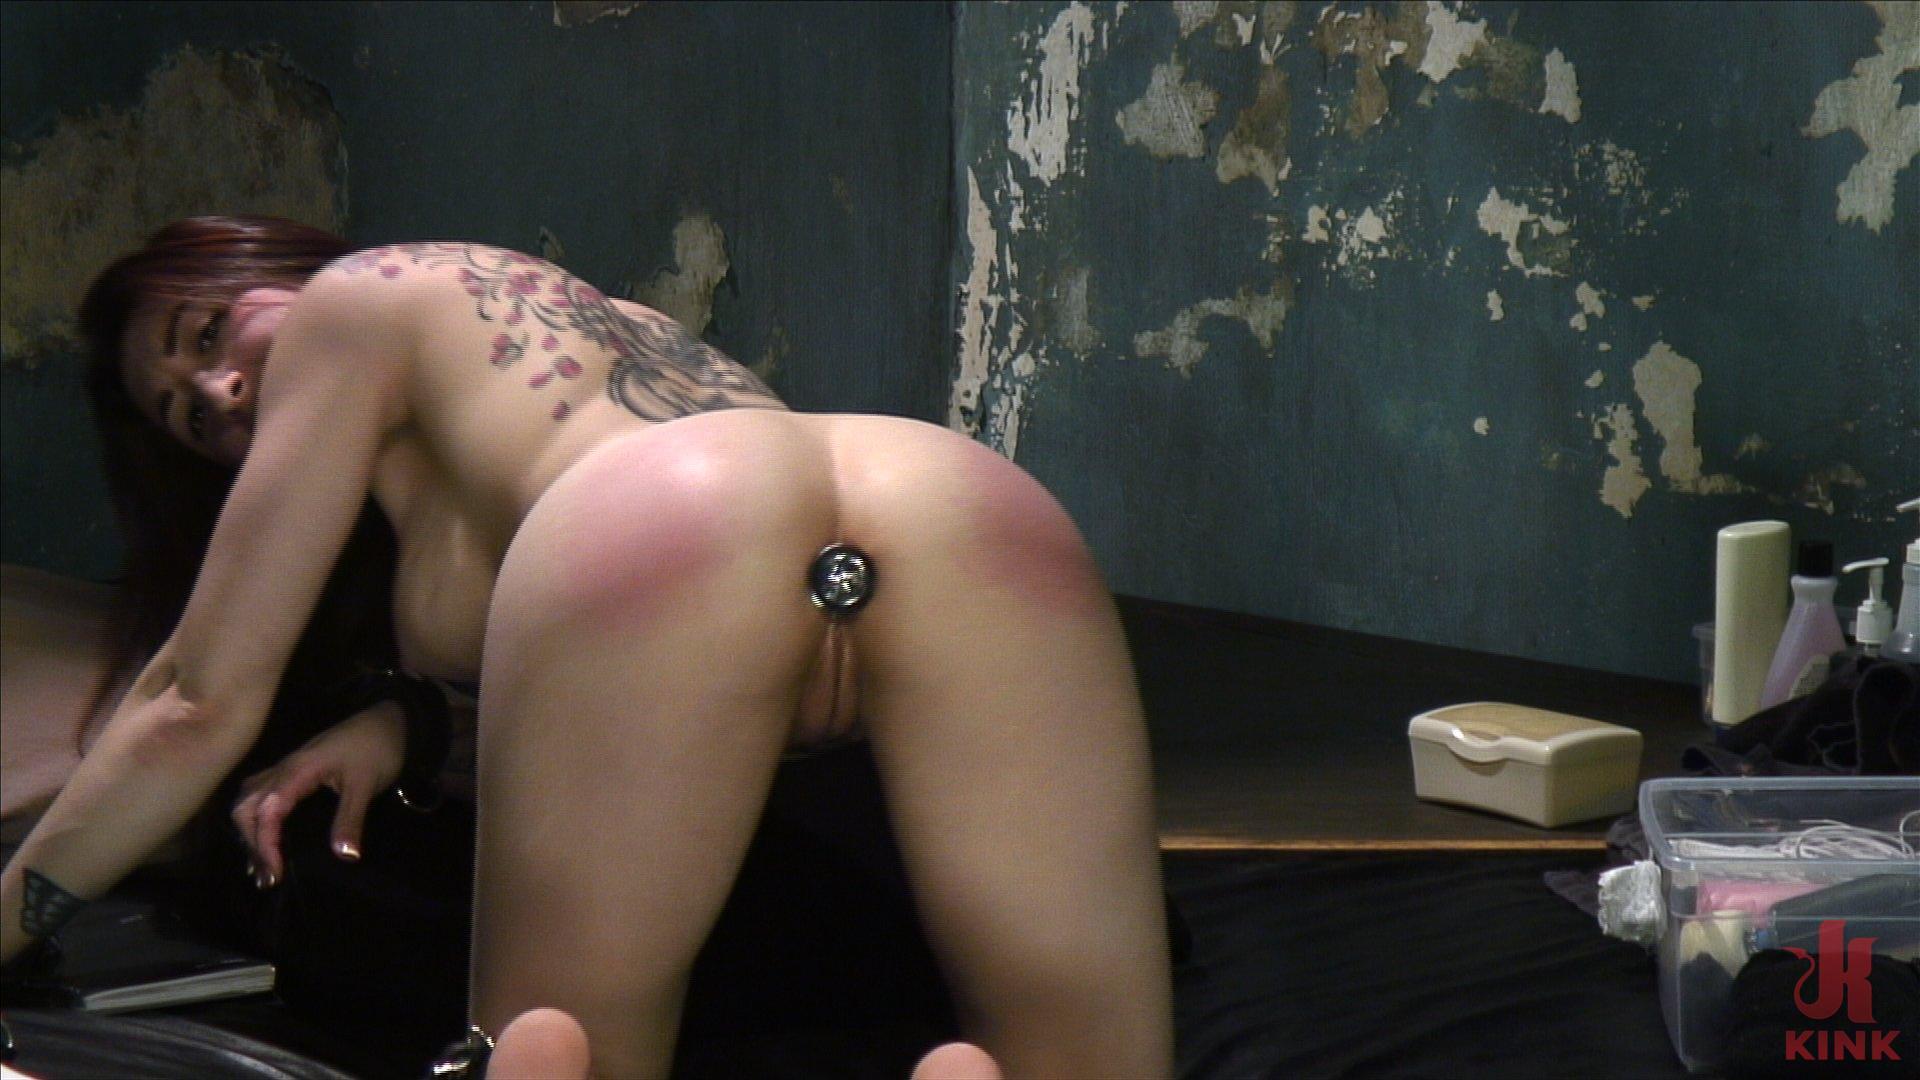 tysk sex cam aktiver javascript